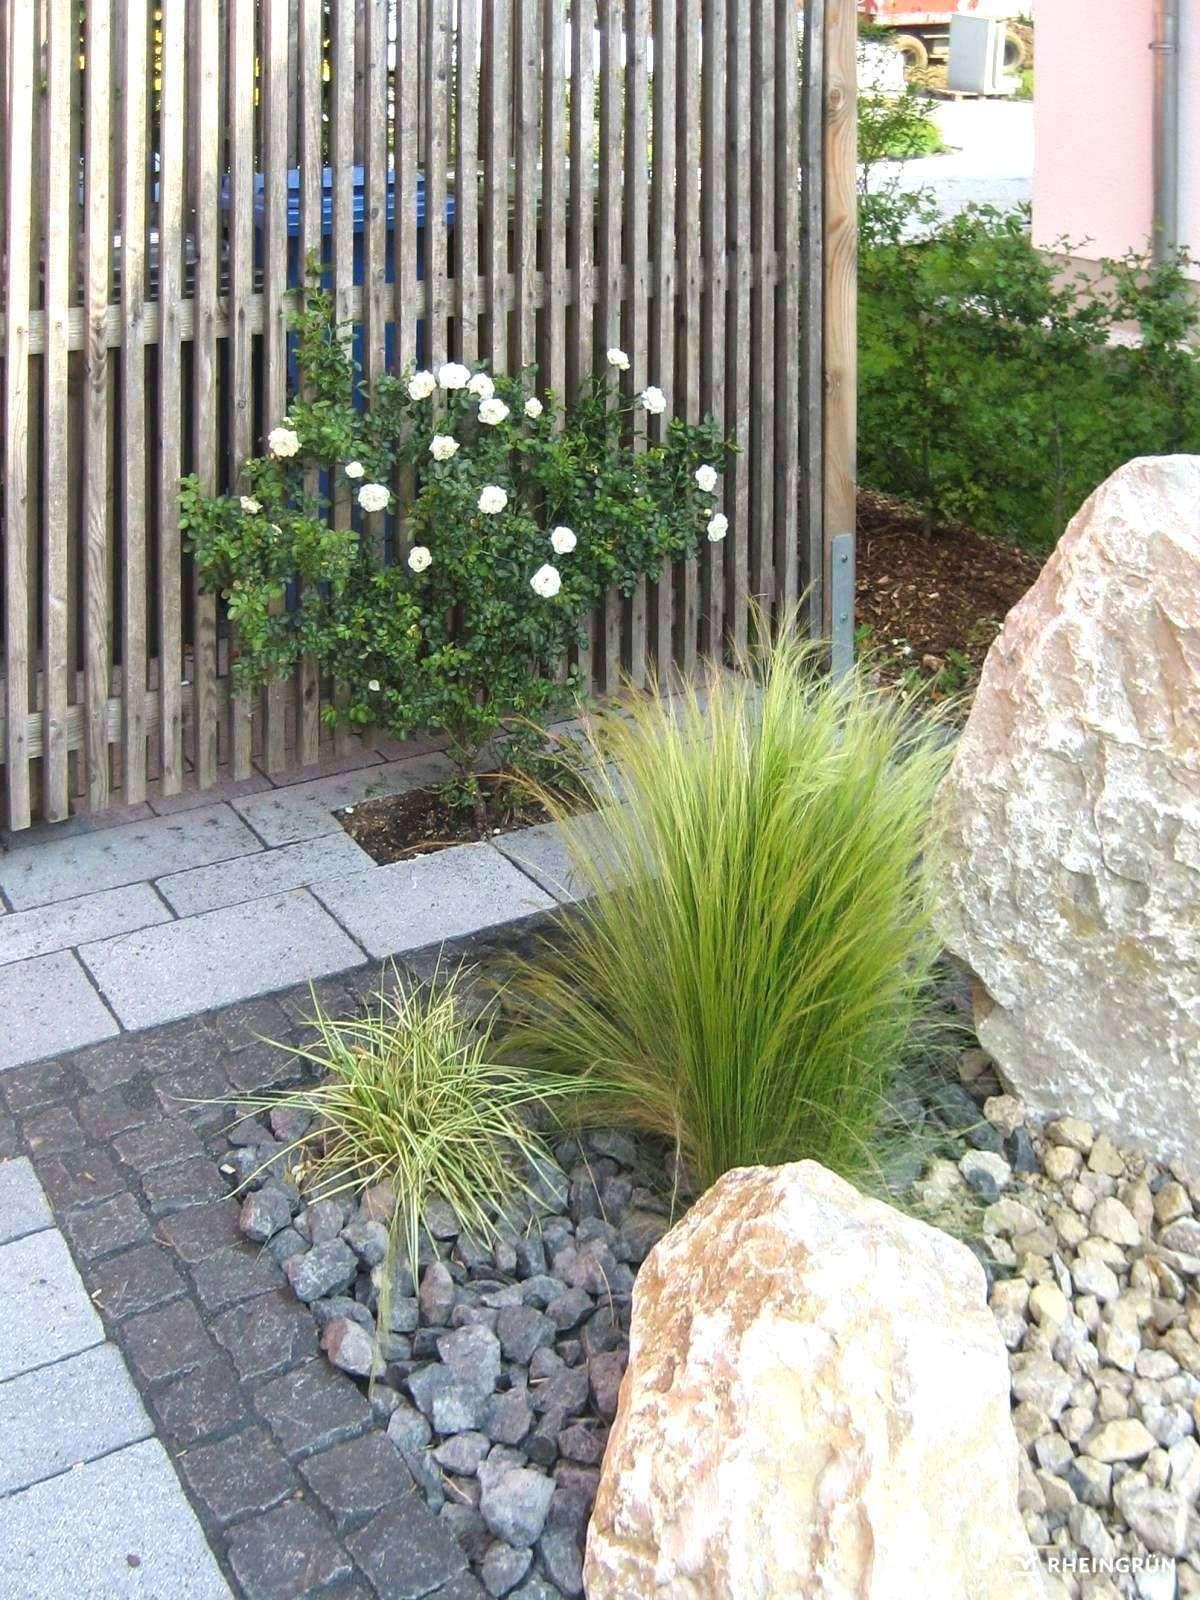 Teich Ideen Garten Inspirierend 26 Genial Garten Modern Gestalten Einzigartig